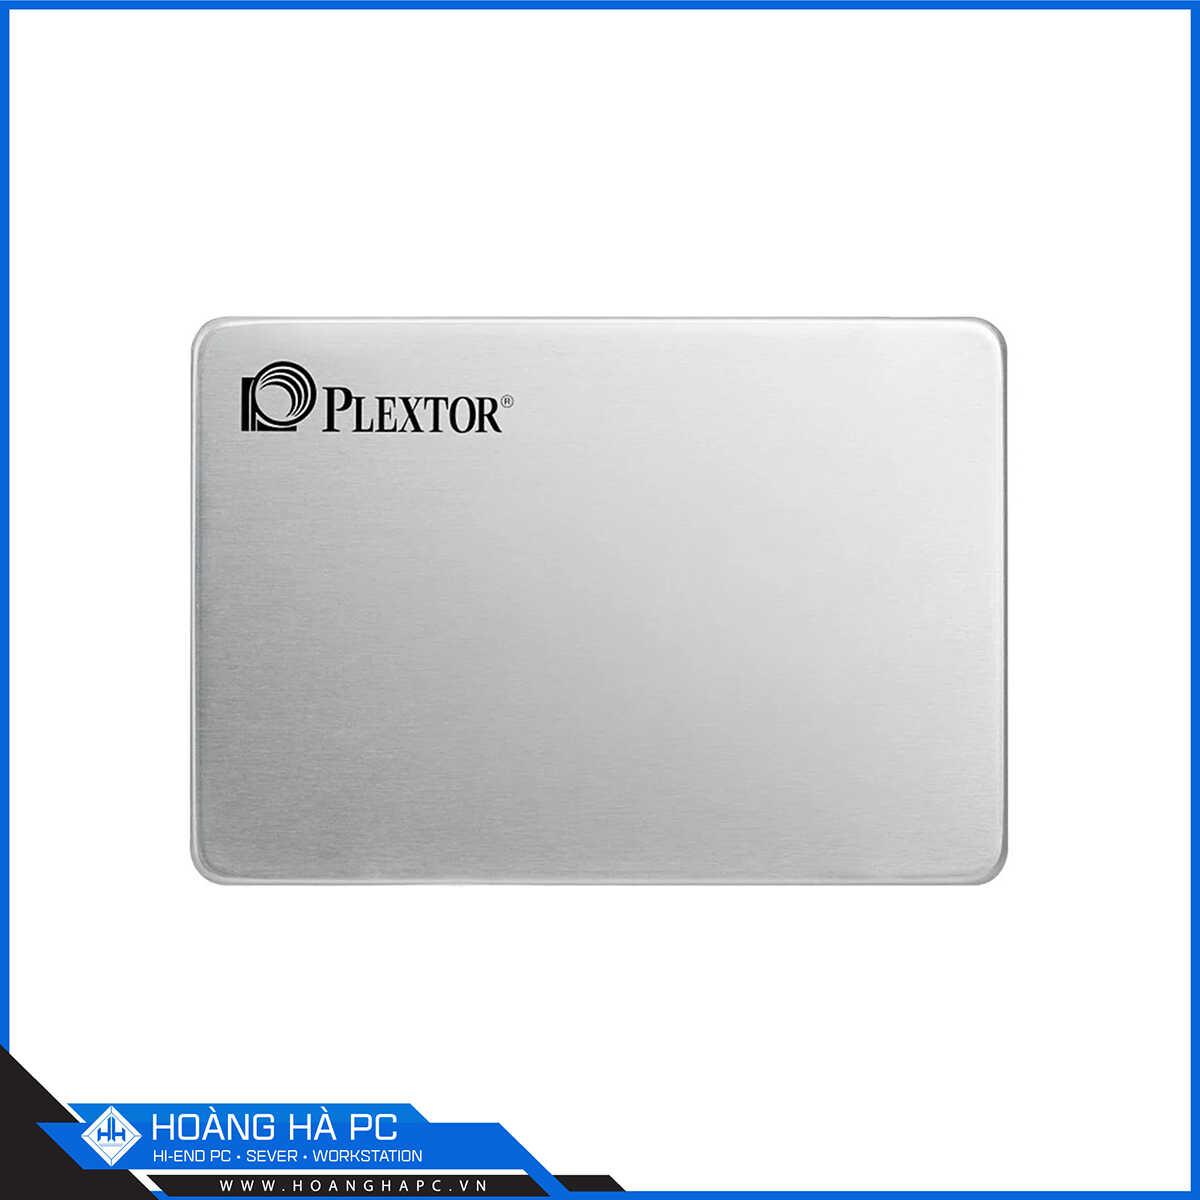 SSD Plextor PX-128S3C Series 128GB